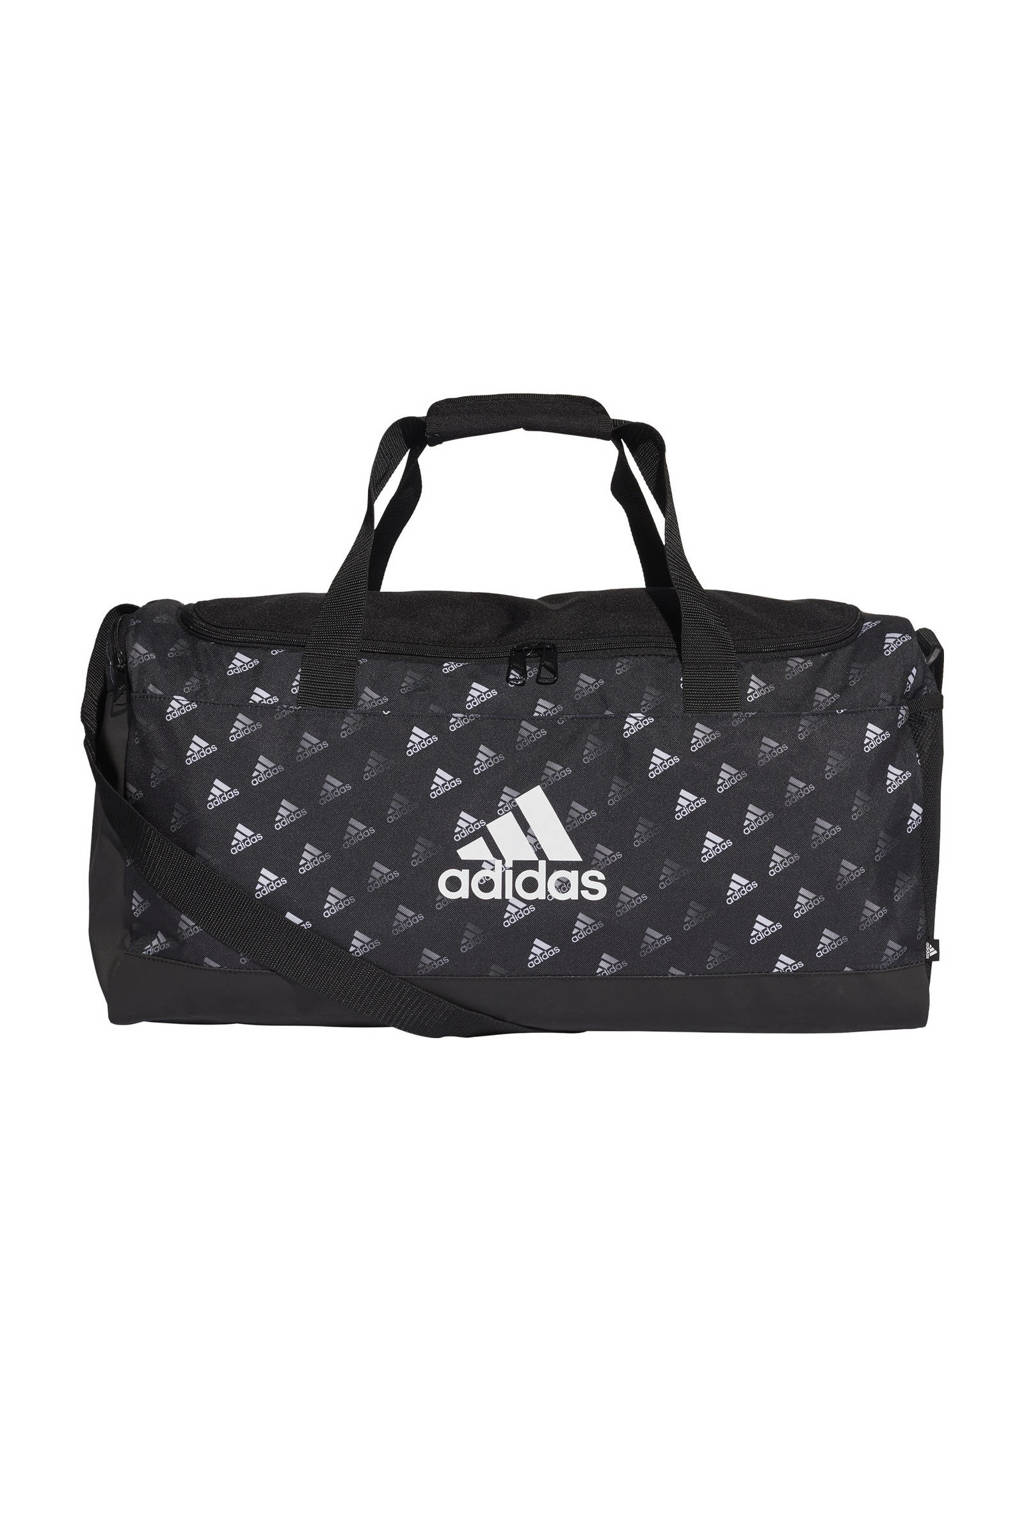 adidas Performance   sporttas zwart/wit, Zwart/wit